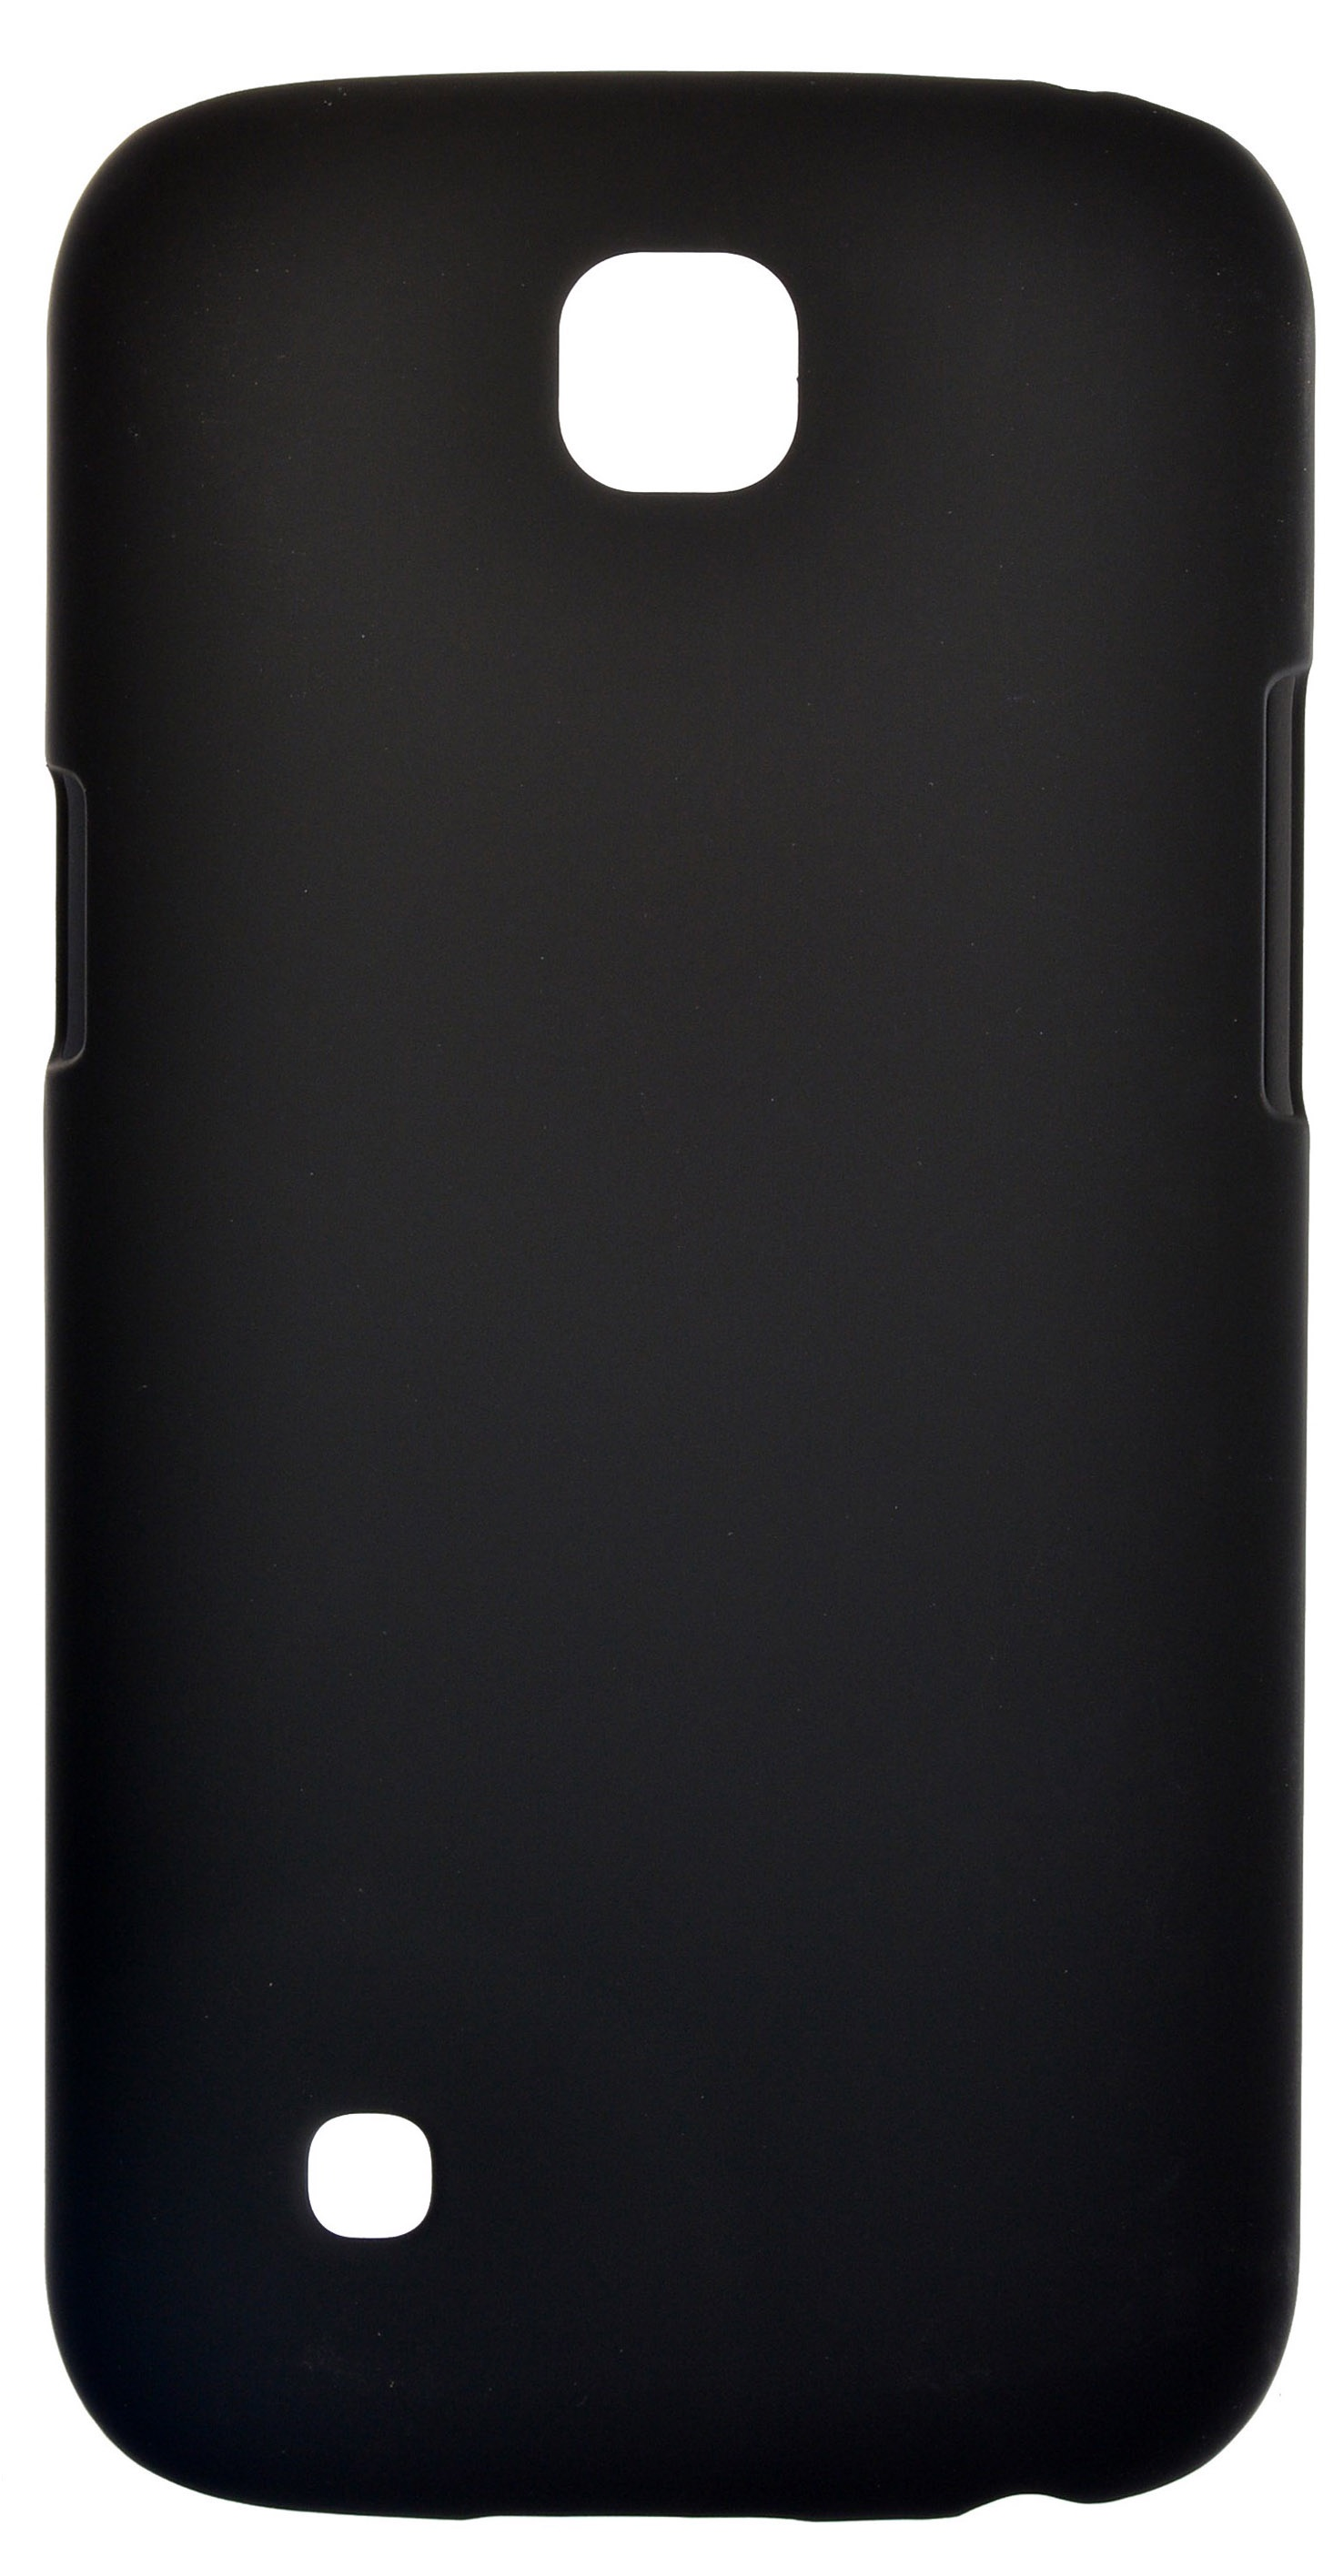 Накладка Skinbox 4People для LG K3, 2000000097374, черный накладка skinbox для lg g4s 2000000079226 черный